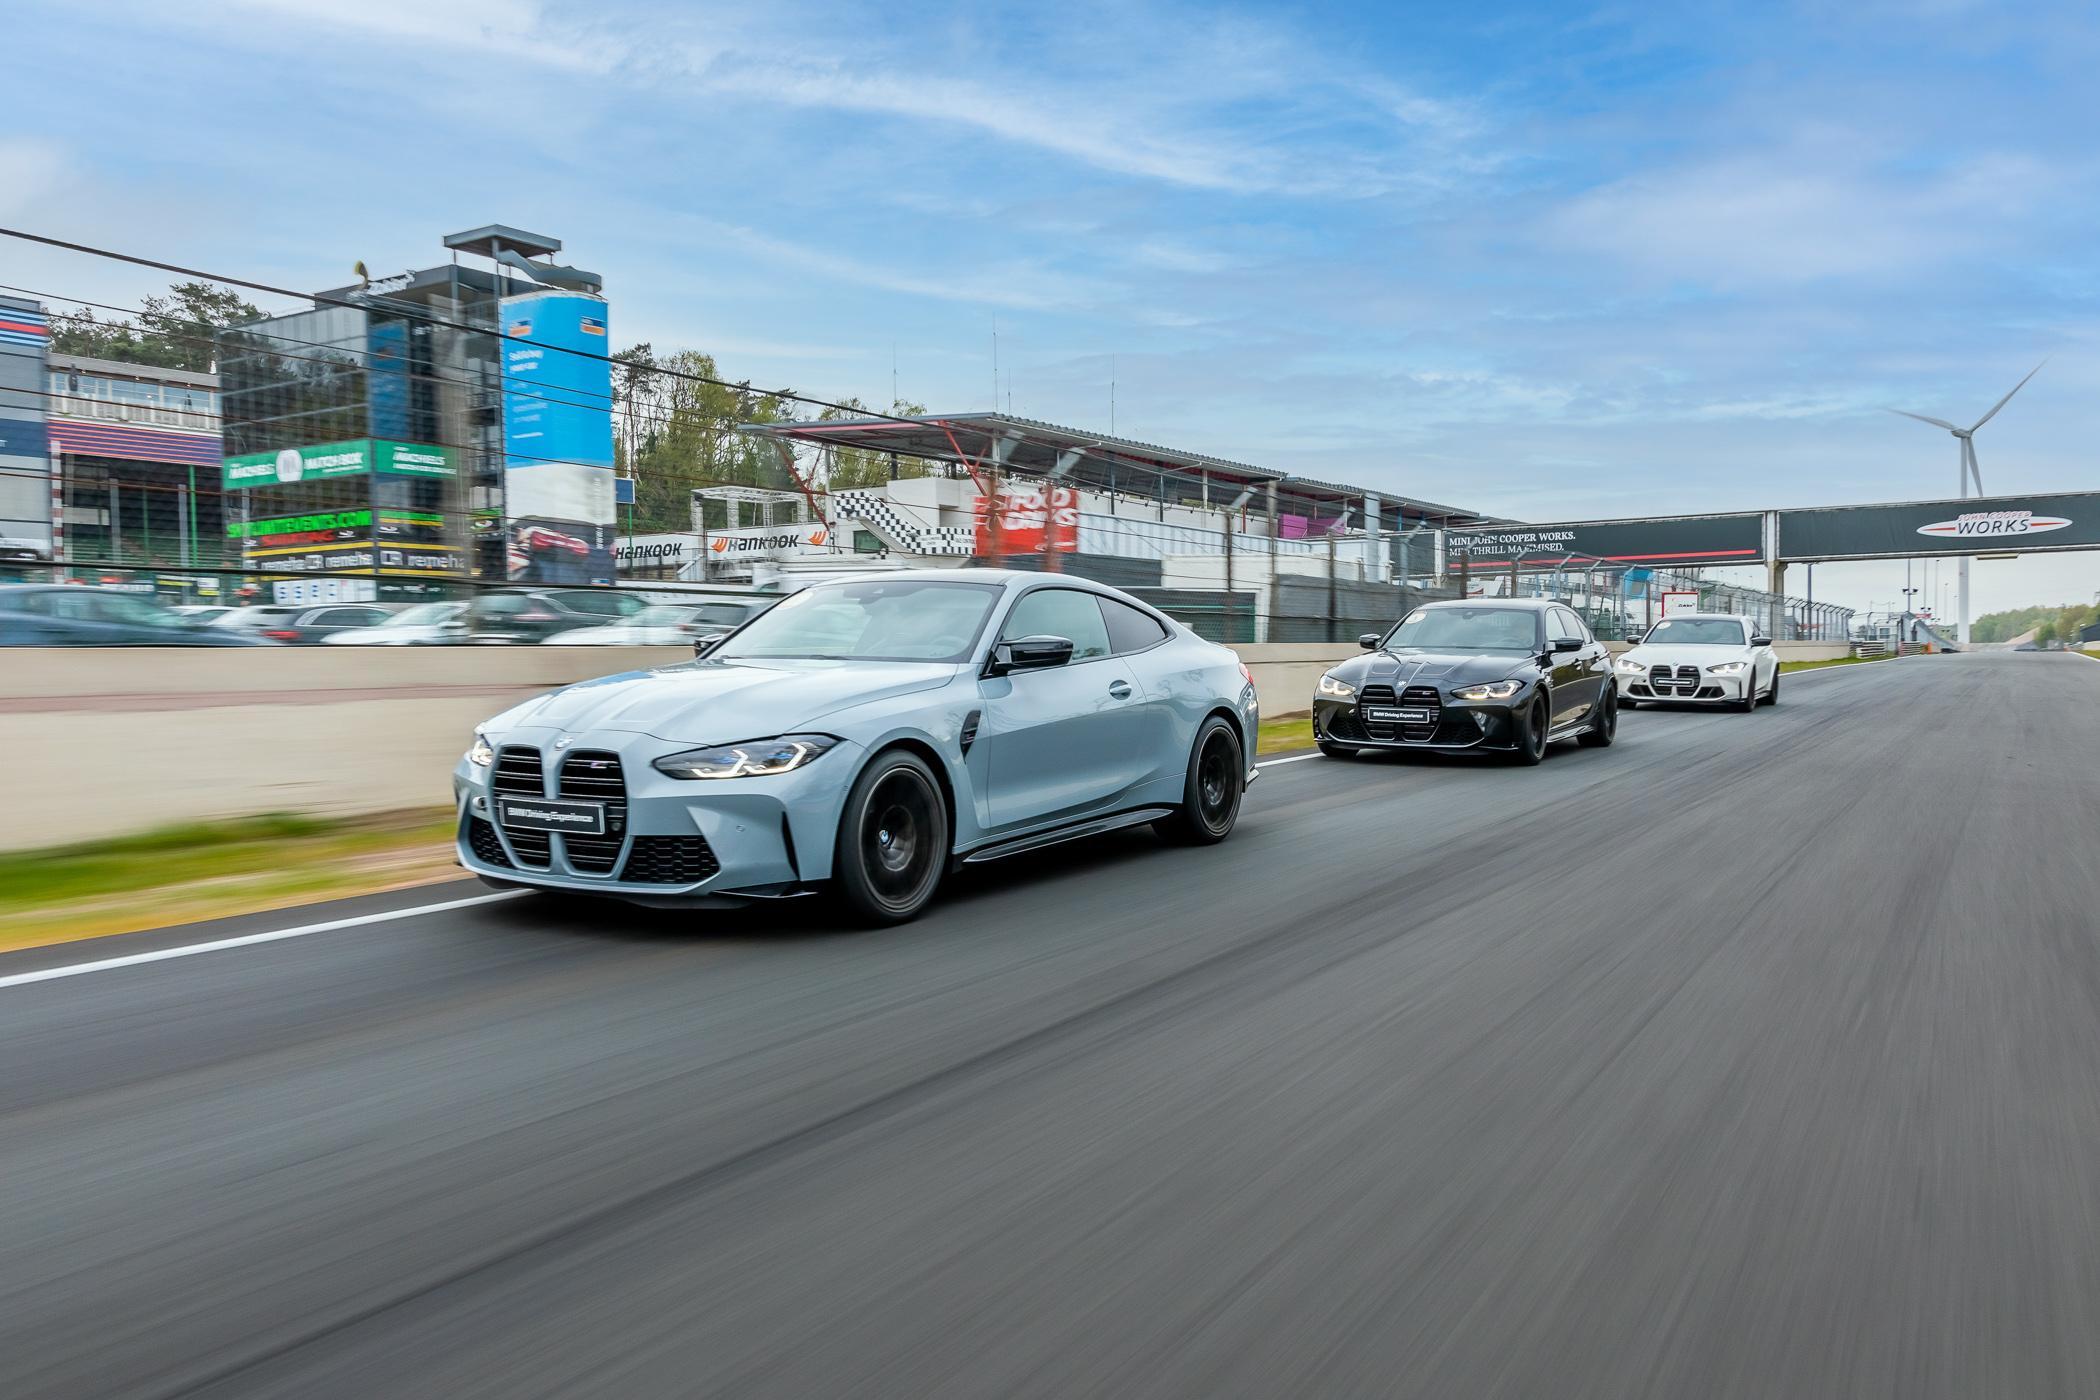 BMW Race Track